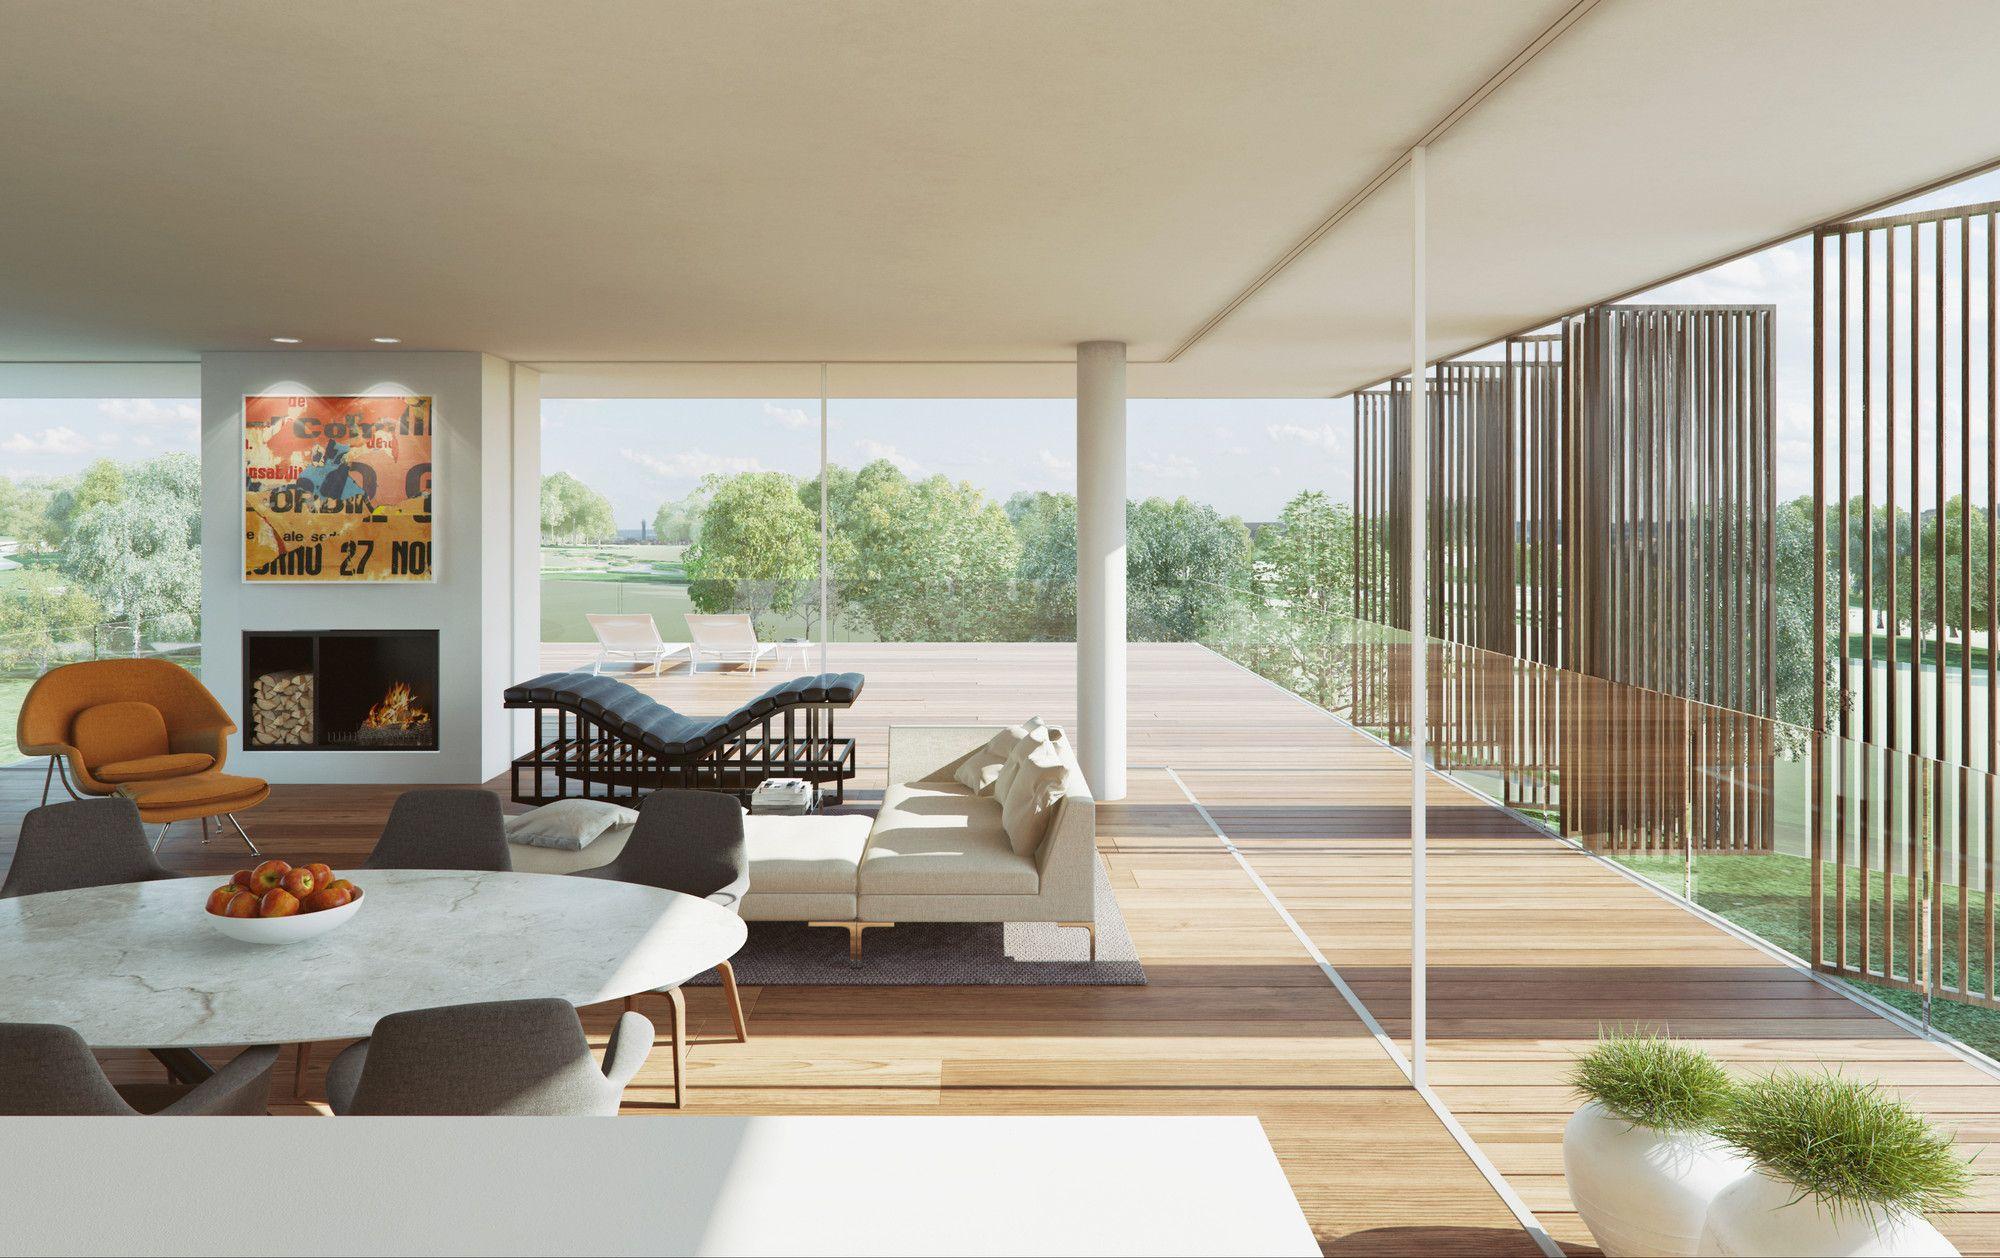 Gallery - Jiřičná, Meier And Pawson Appointed To Design Residential Development Near Prague - 6